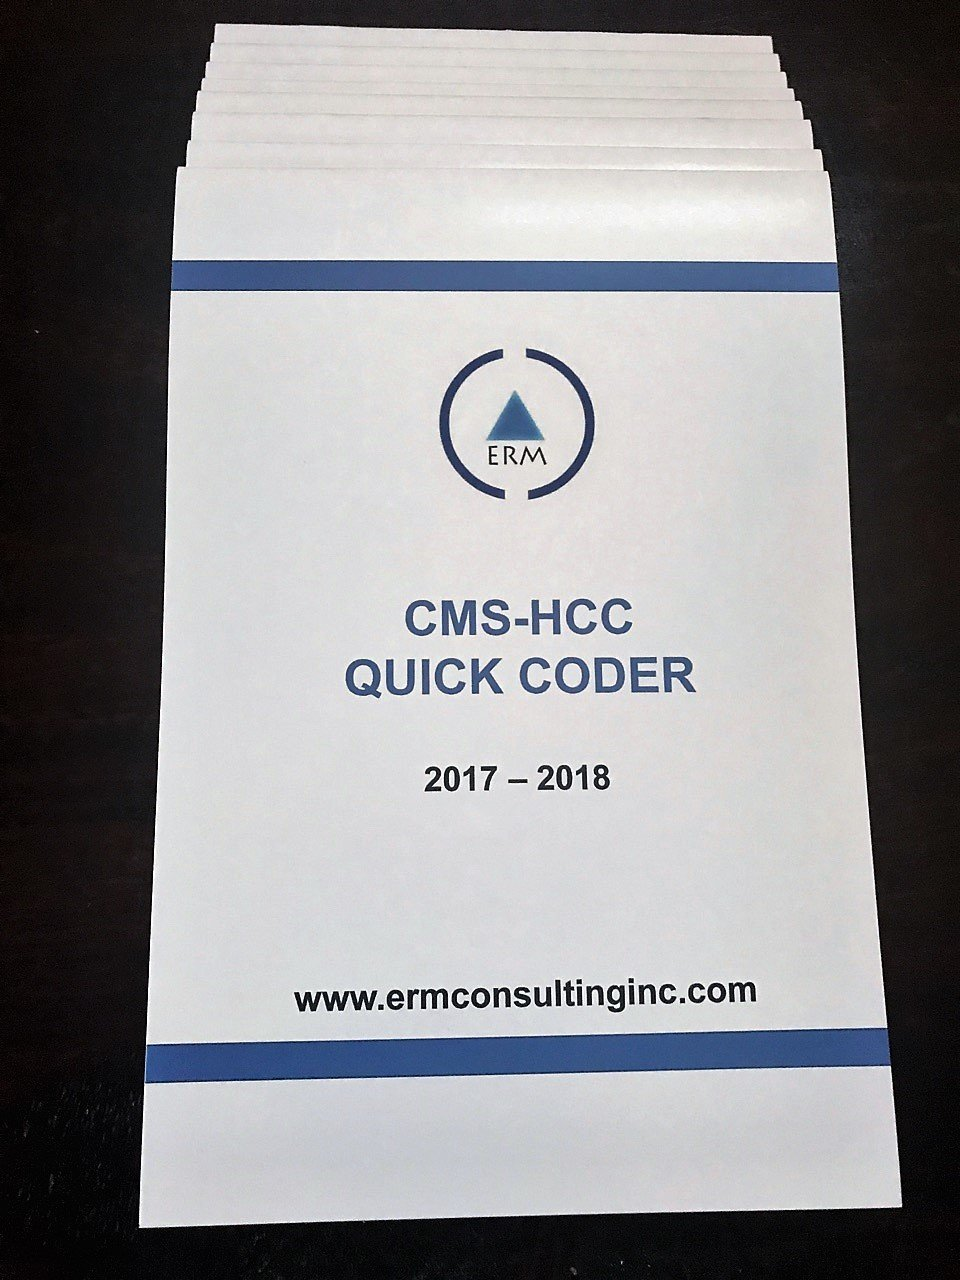 CMS-HCC Quick Coder